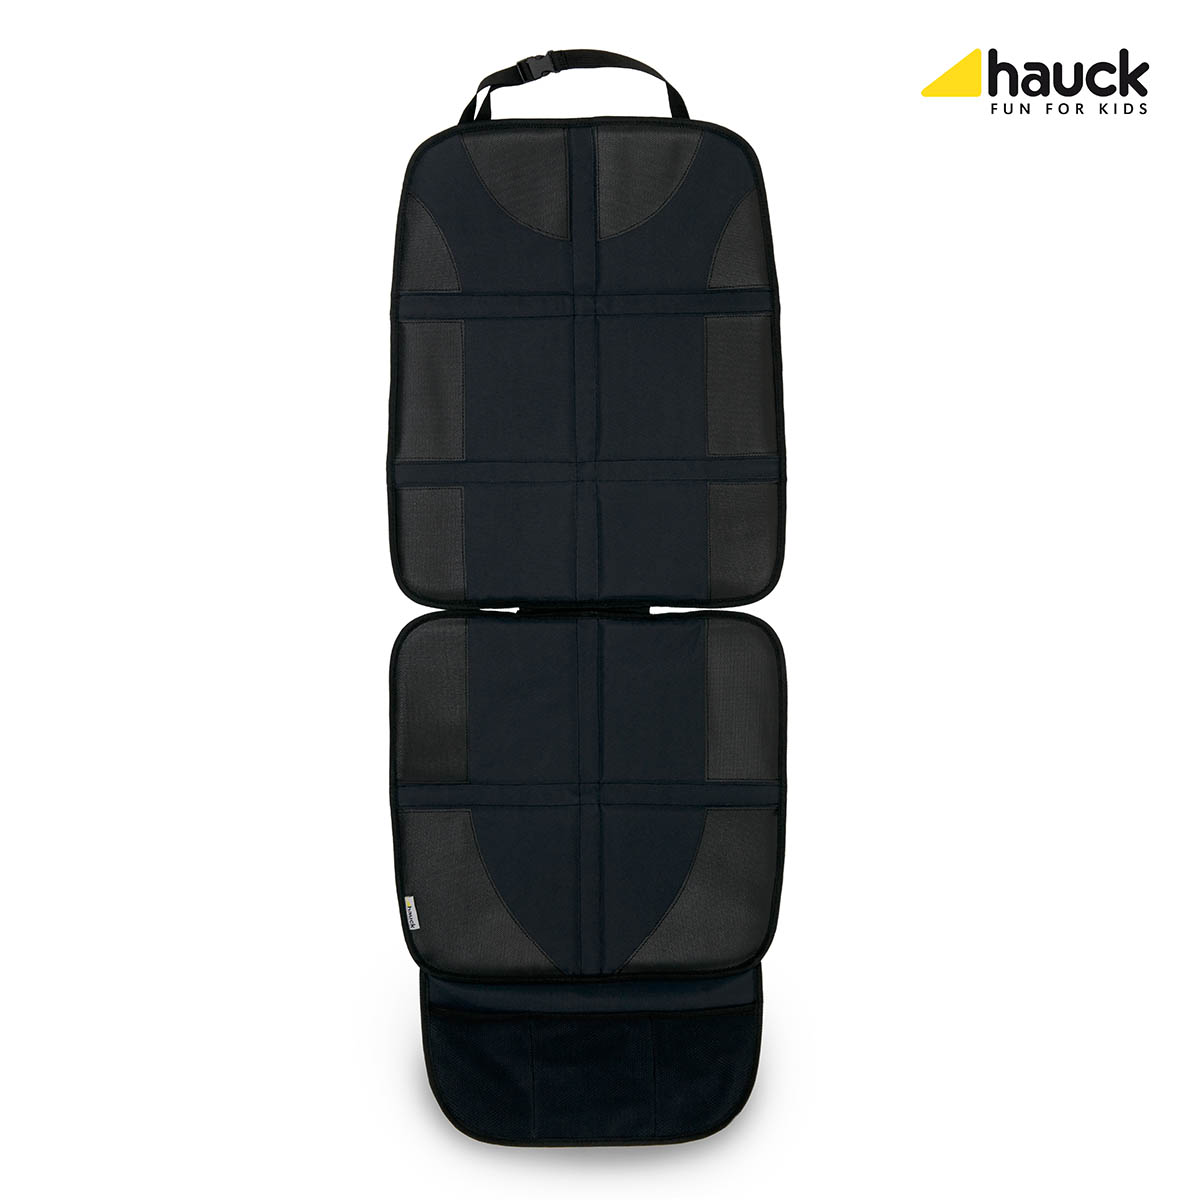 Hauxk automašīnas sēdekļa aizsargs - Sit on Me Delux